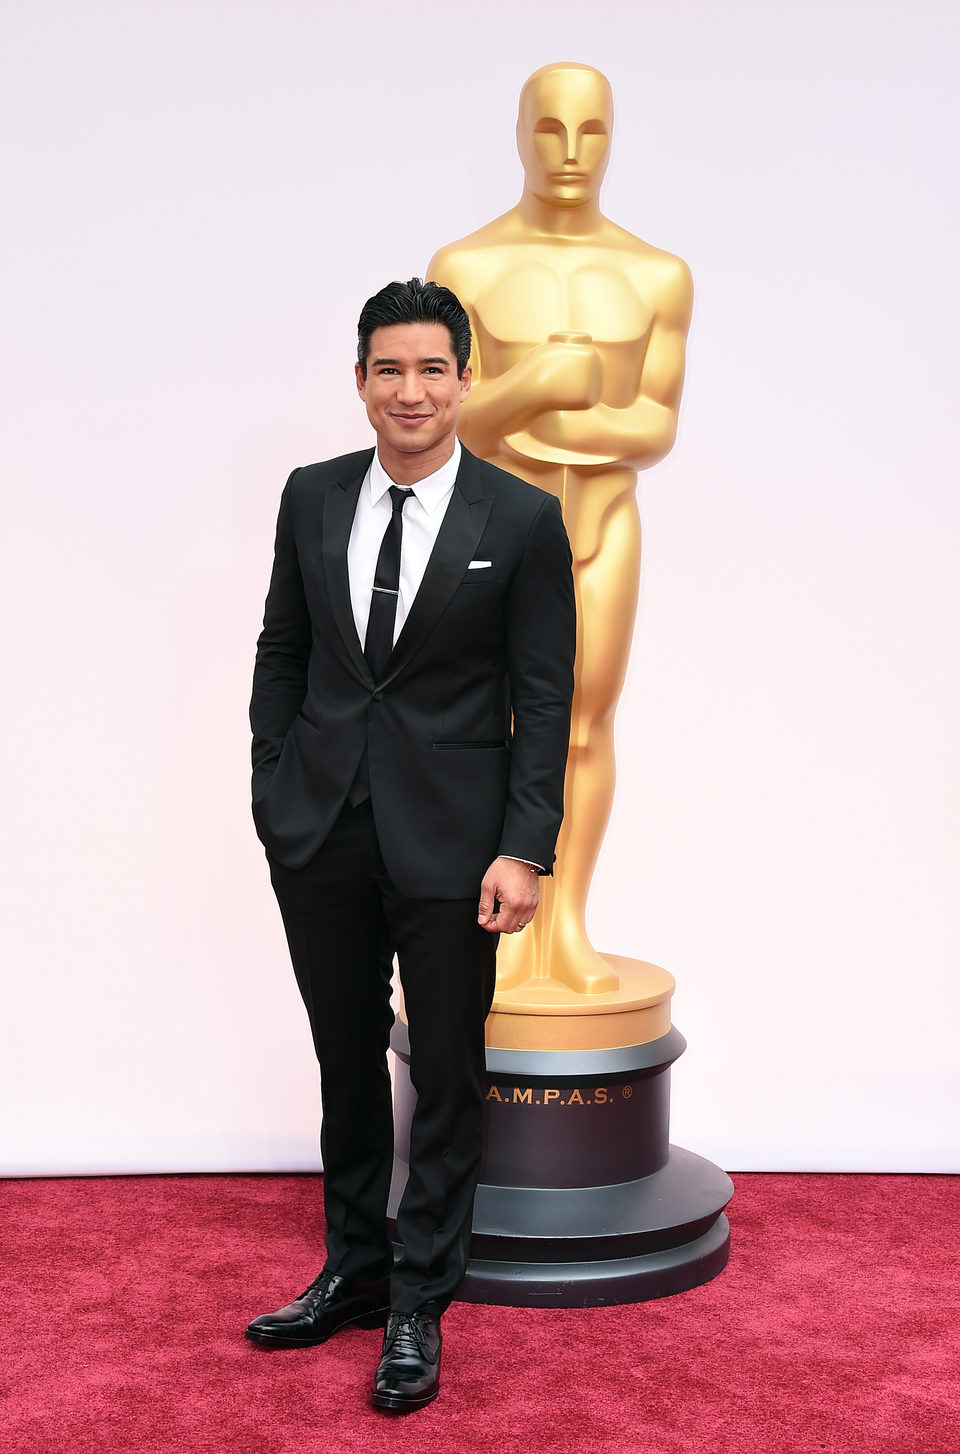 Mario Lopez at the Oscars award 2015 red carpet